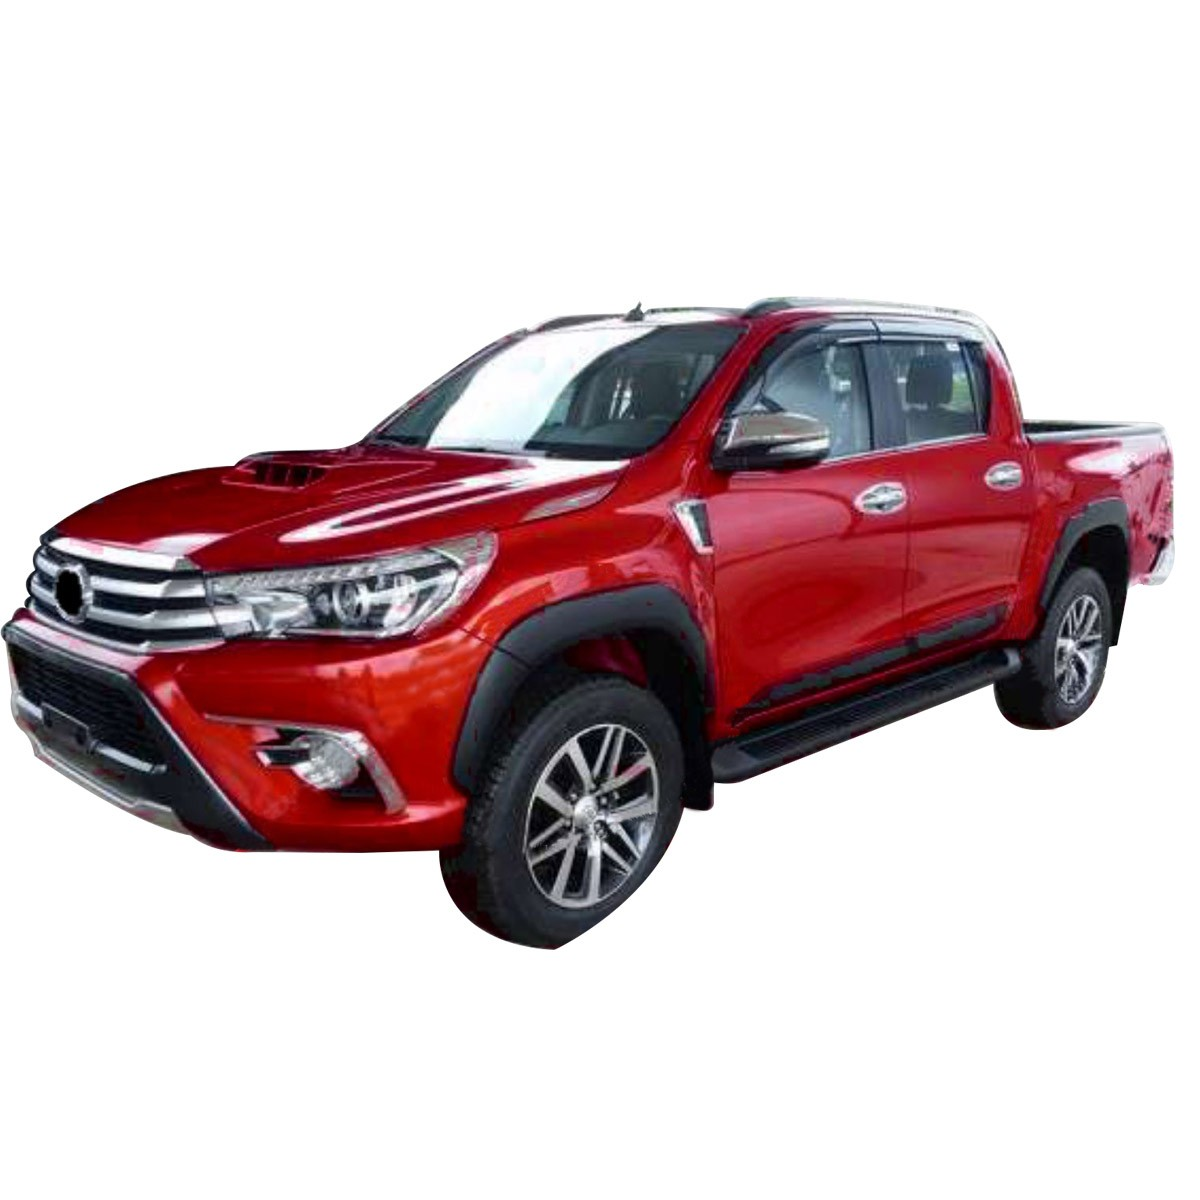 Alargador De Paralamas Original Oem Toyota Hilux 2016 A 2018